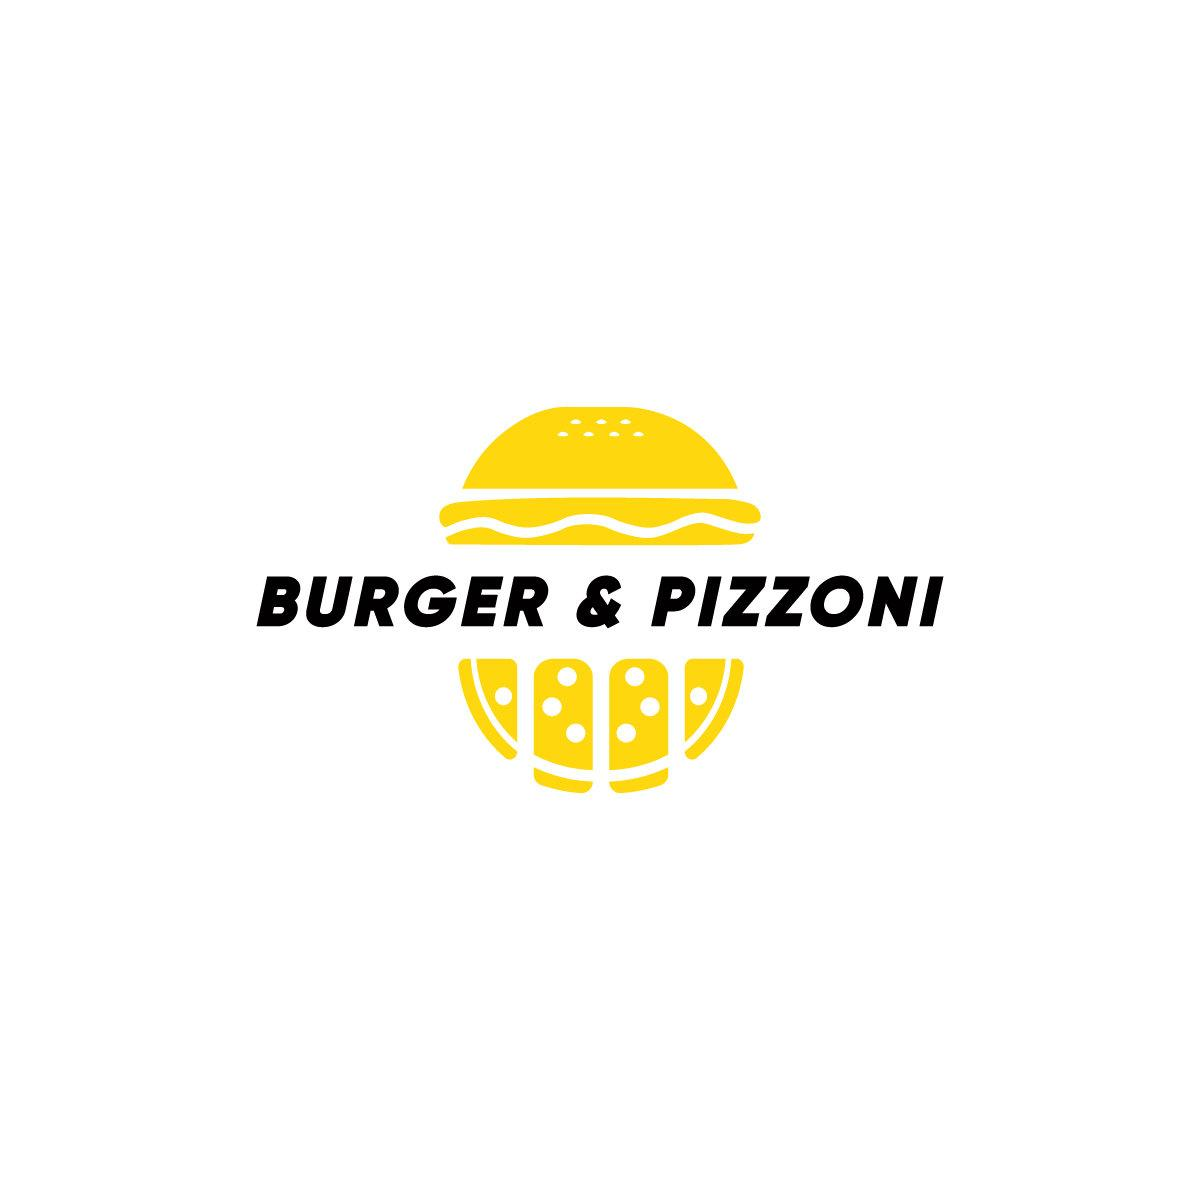 фотография Ресторана Burger&Pizzoni на улице Щепкина